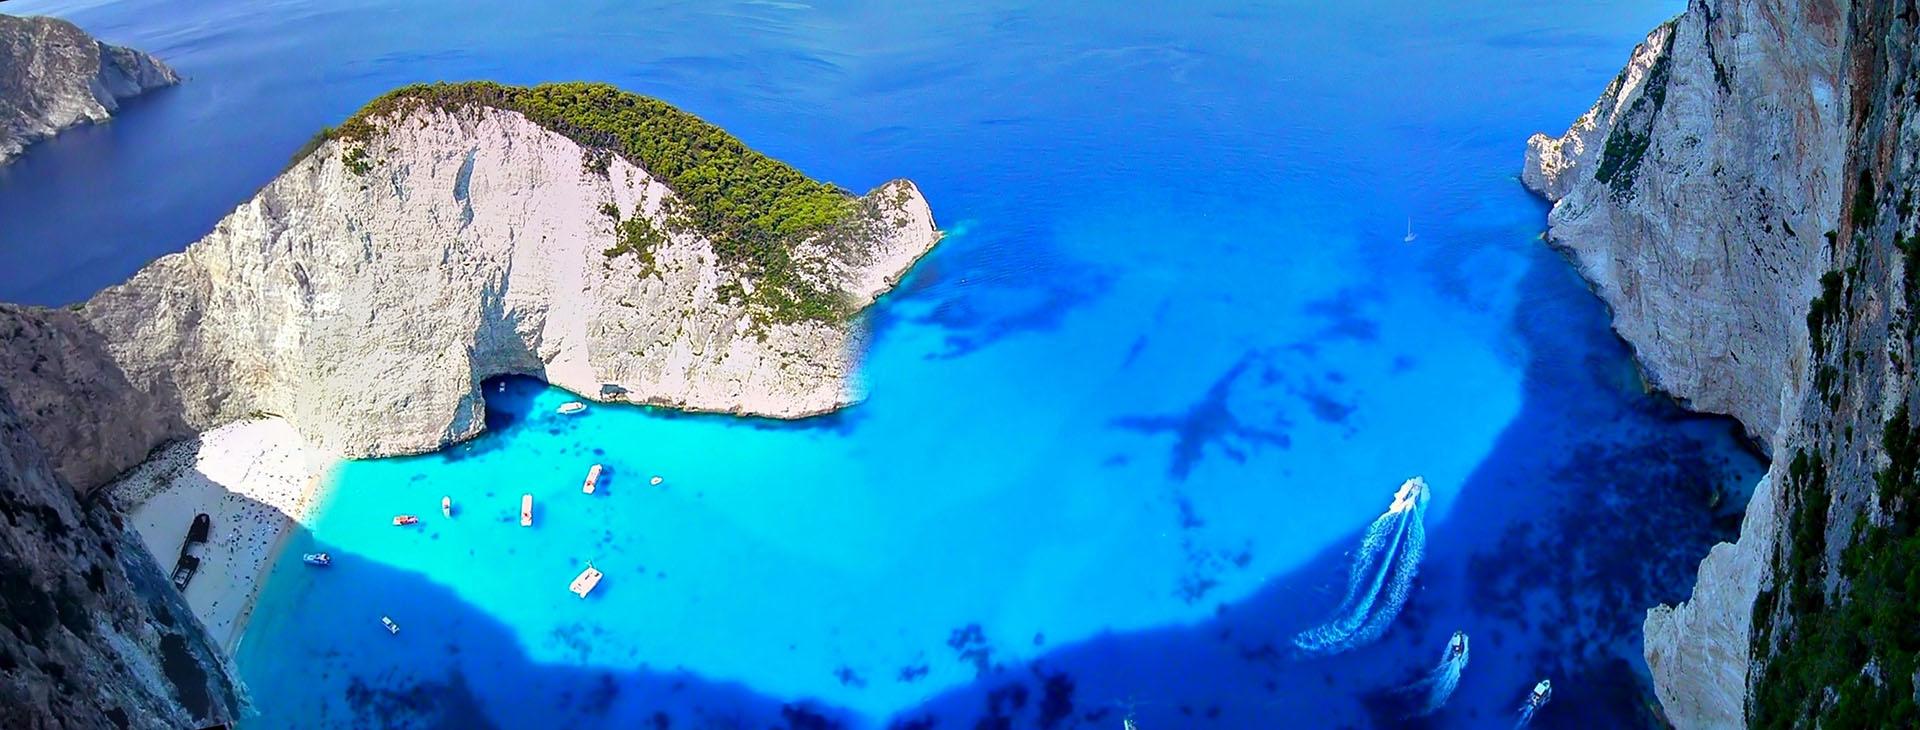 Smugglers Cove - Navagio (Shipwreck) beach on Zakynthos island